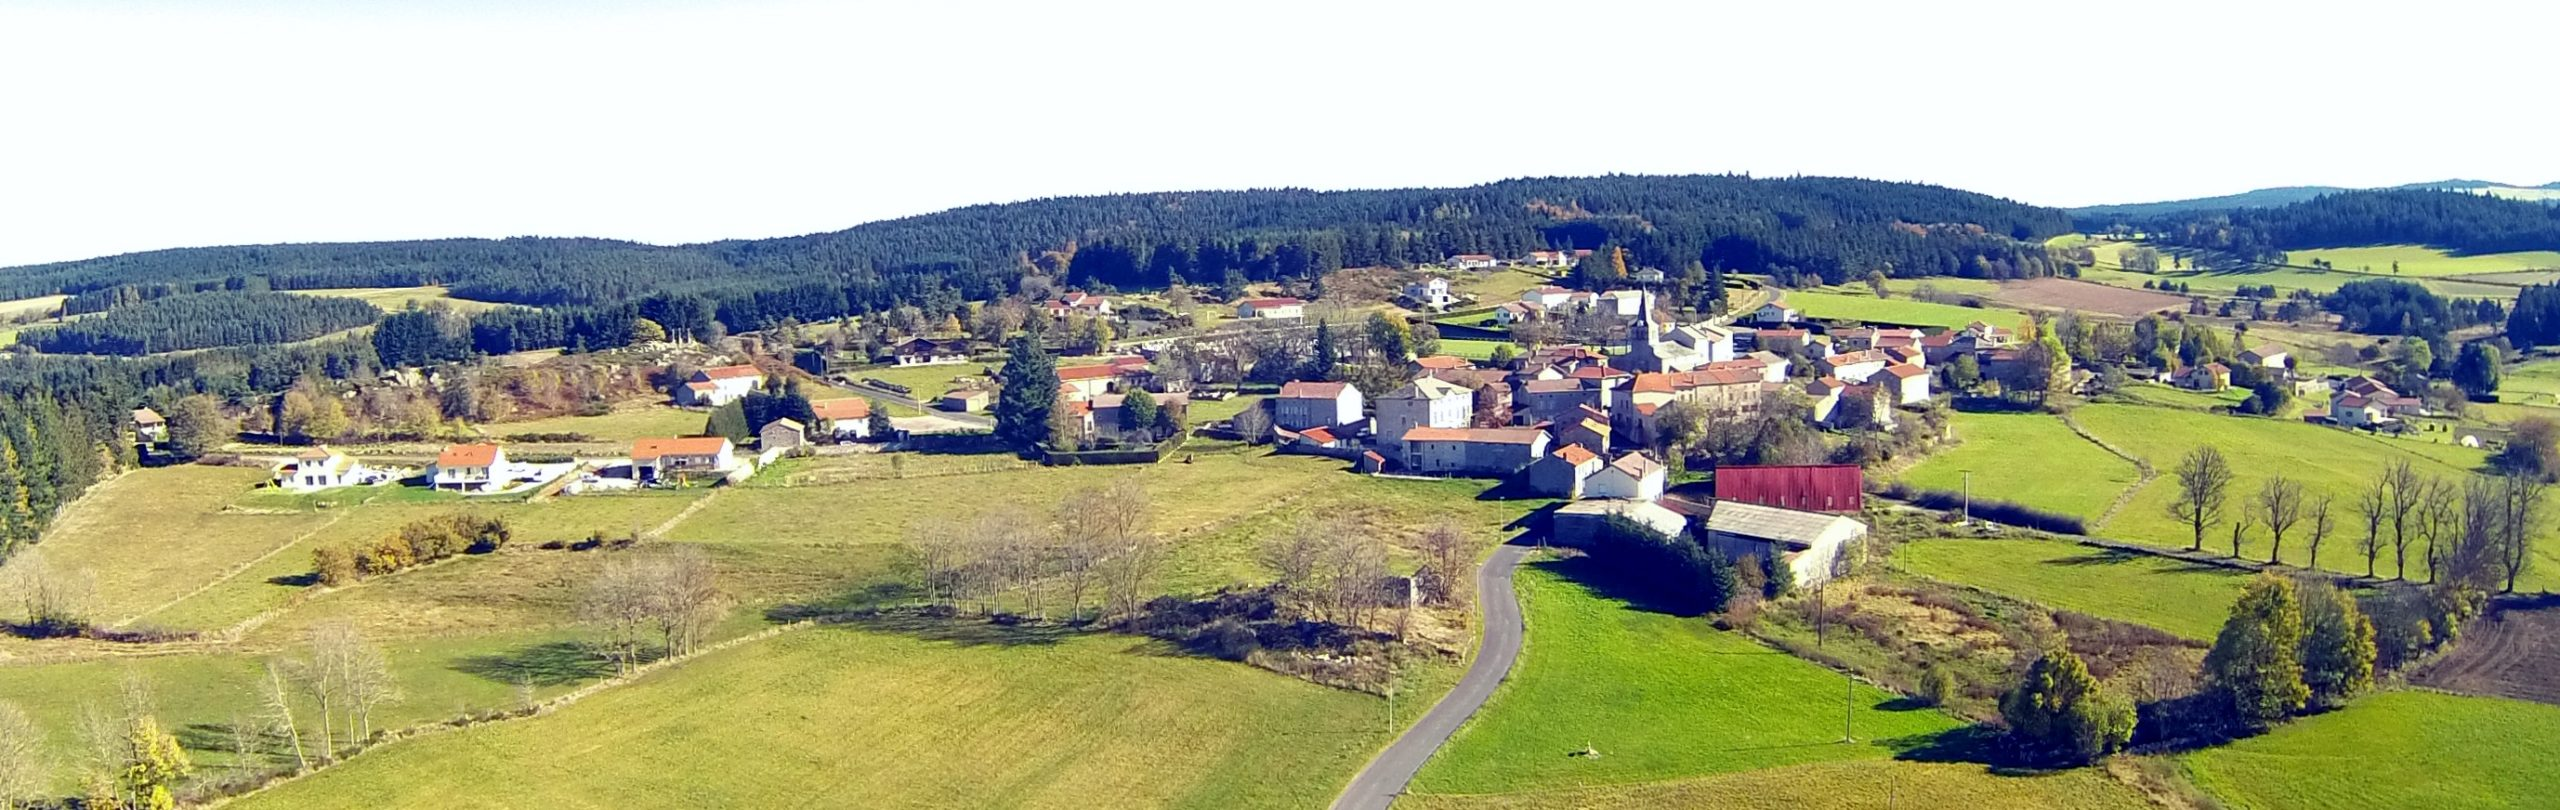 Commune de Montregard